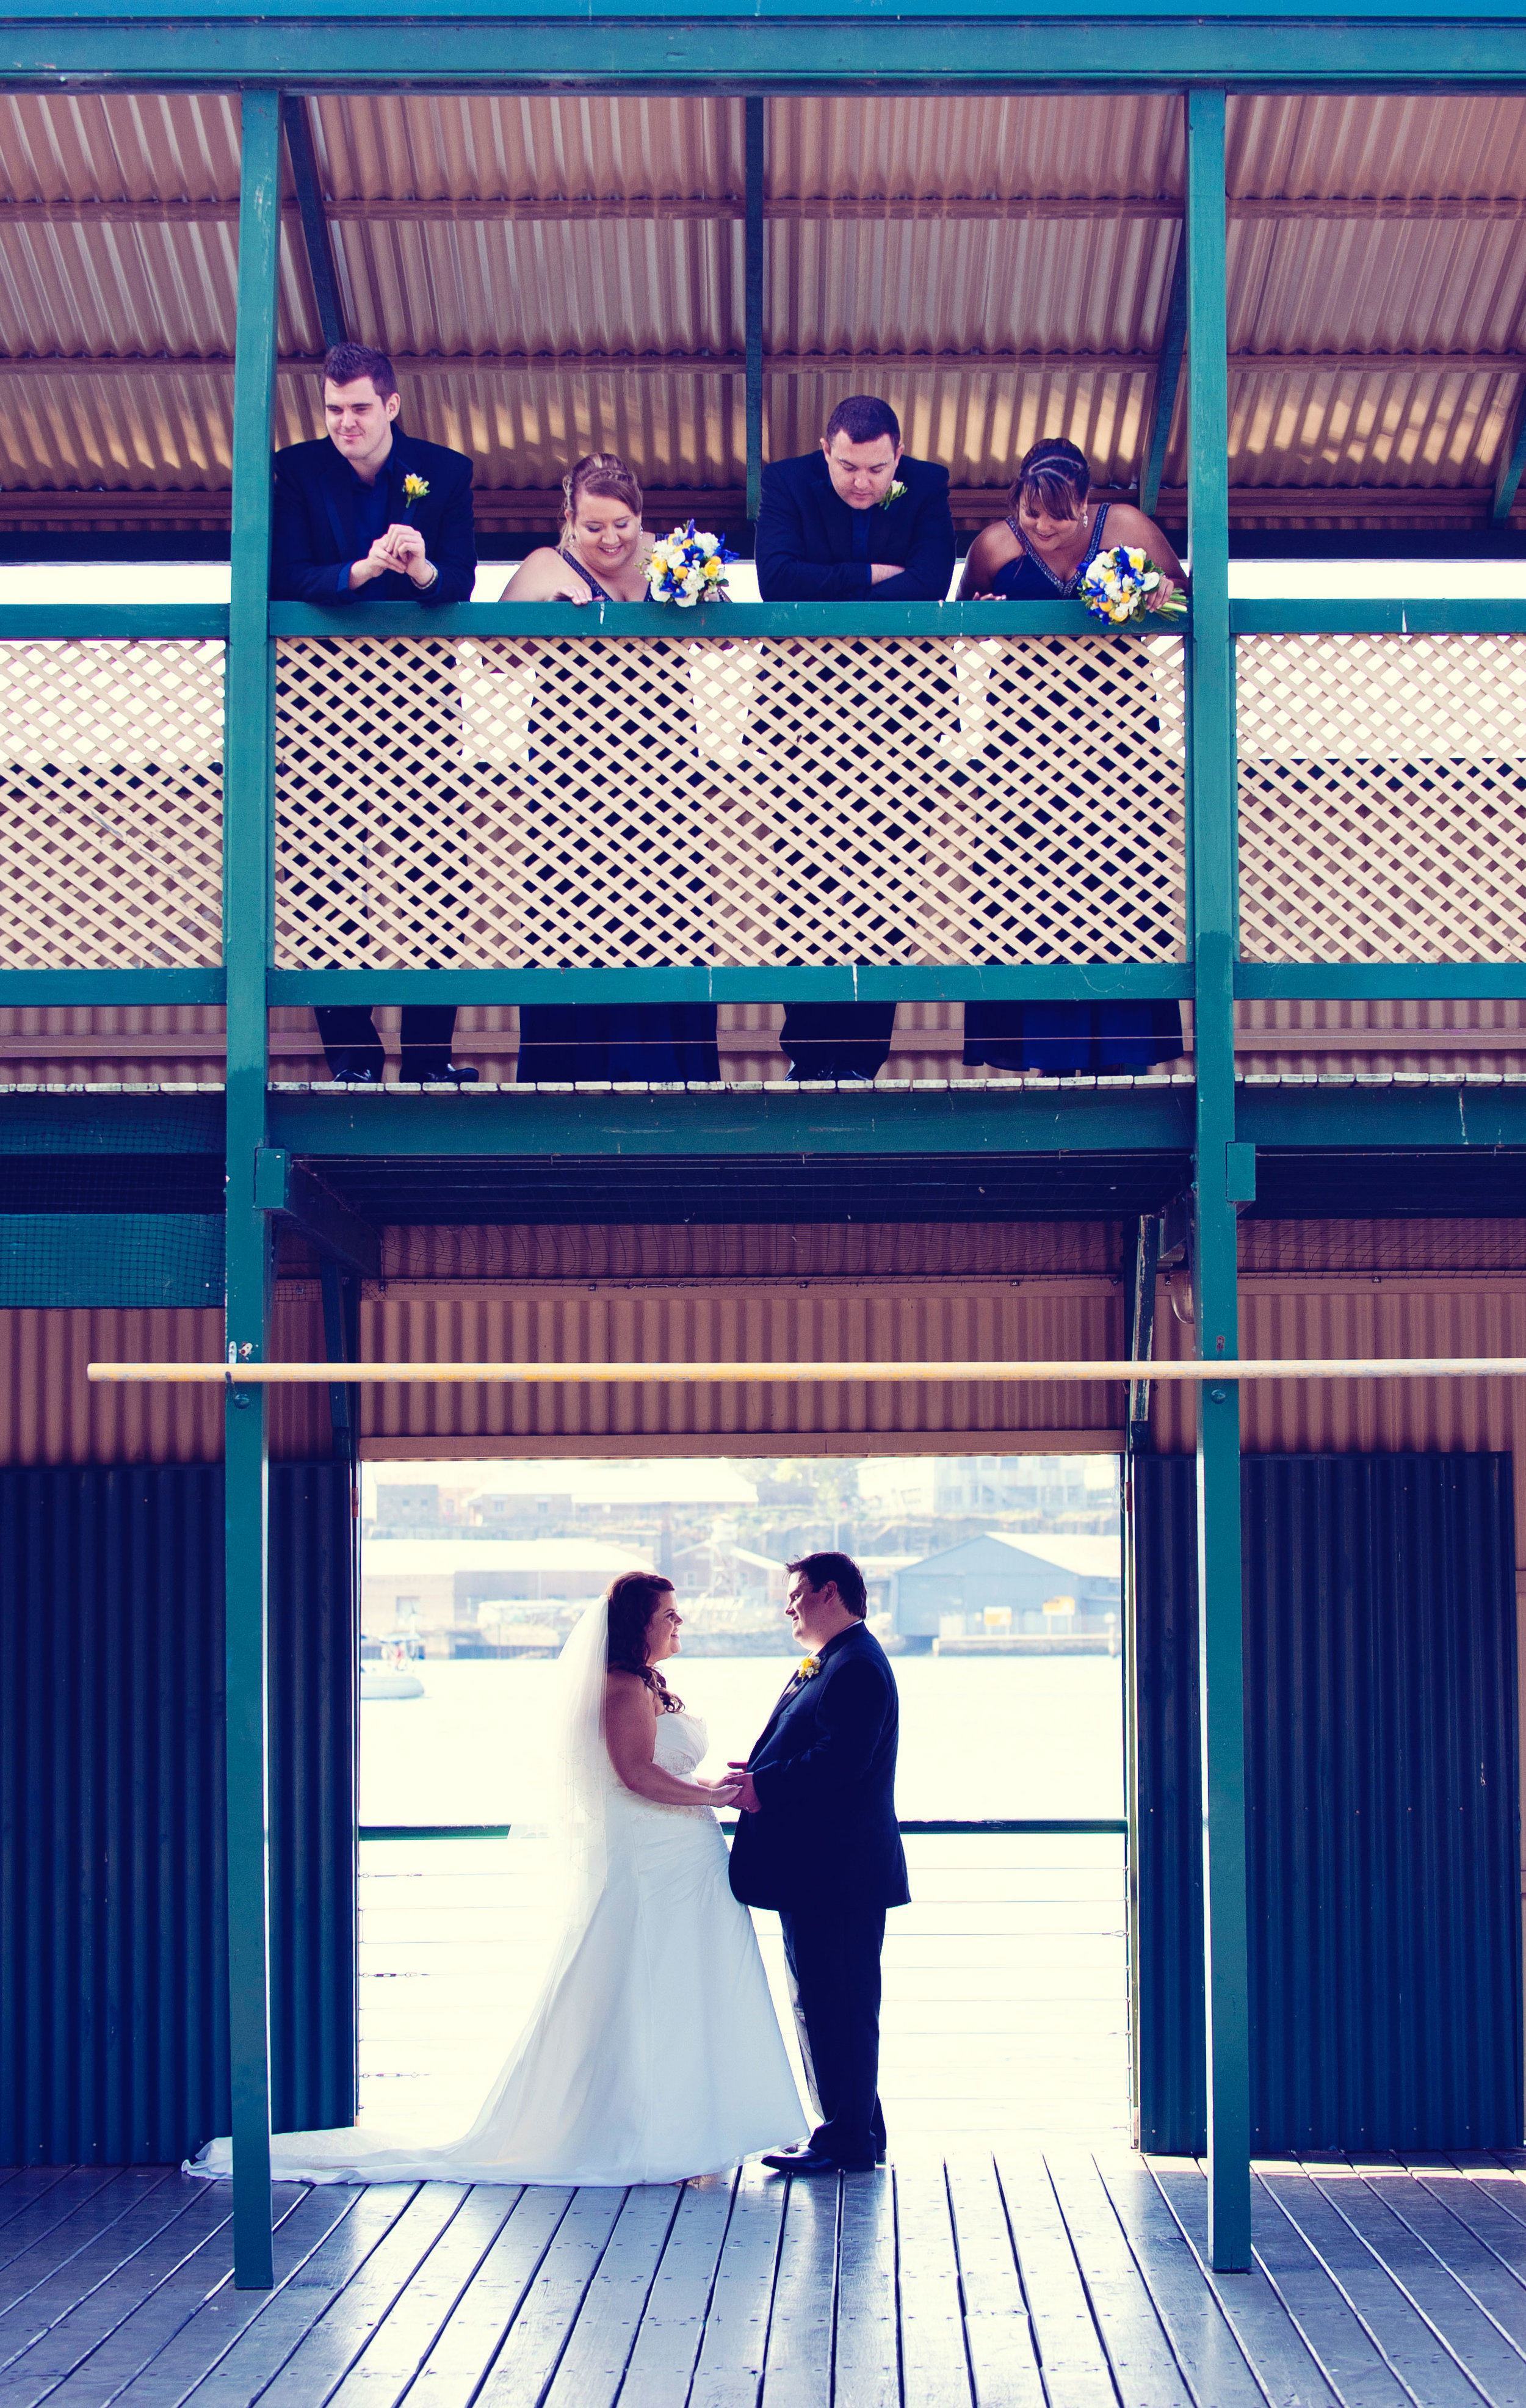 5-Tips-to-Choosing-your-Creative-Wedding-Locations-Sydney-1.jpg